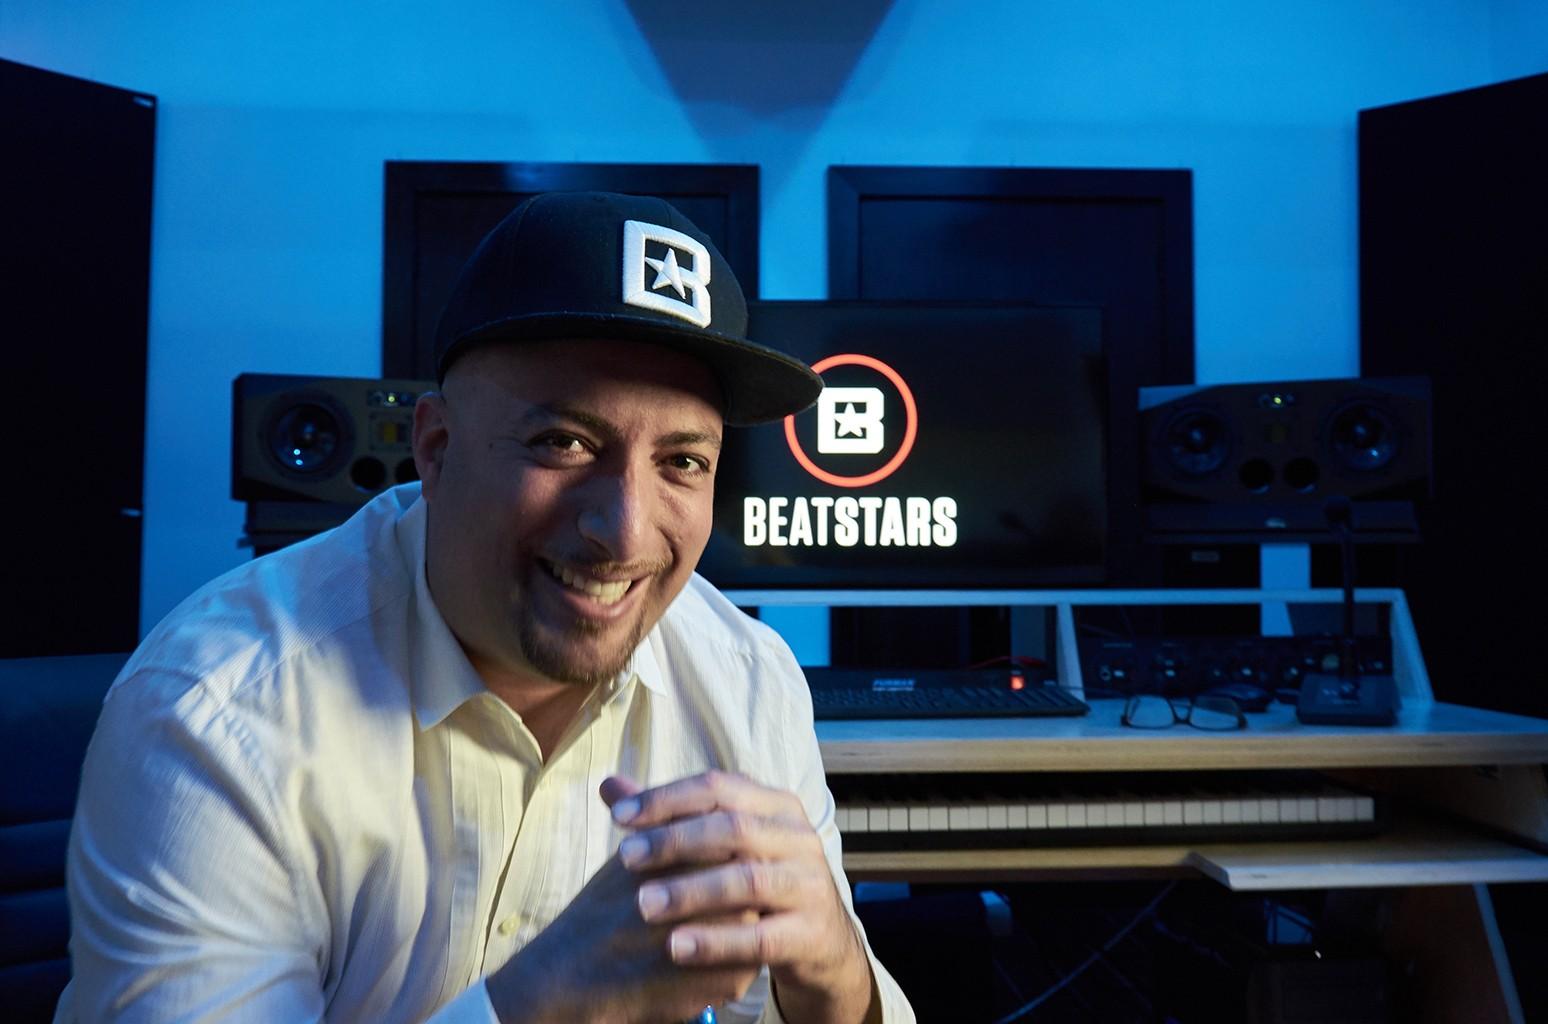 BeatStars founder Abe Batshon